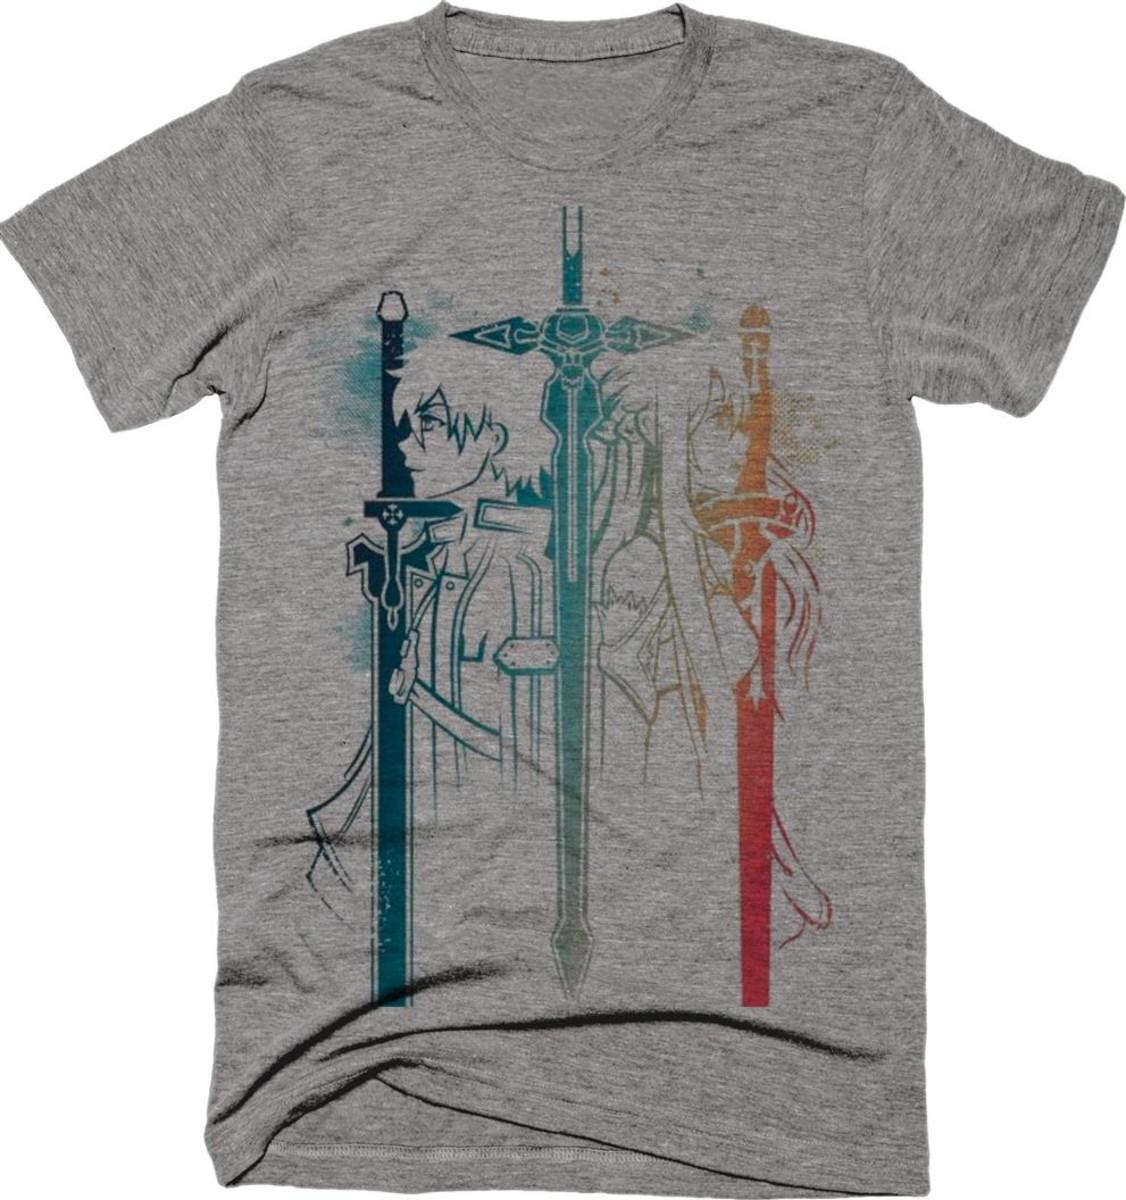 a3b4edf2b Camiseta Anime SAO Sword Art Online Kirito Asuna Mescla 01 no Elo7 ...